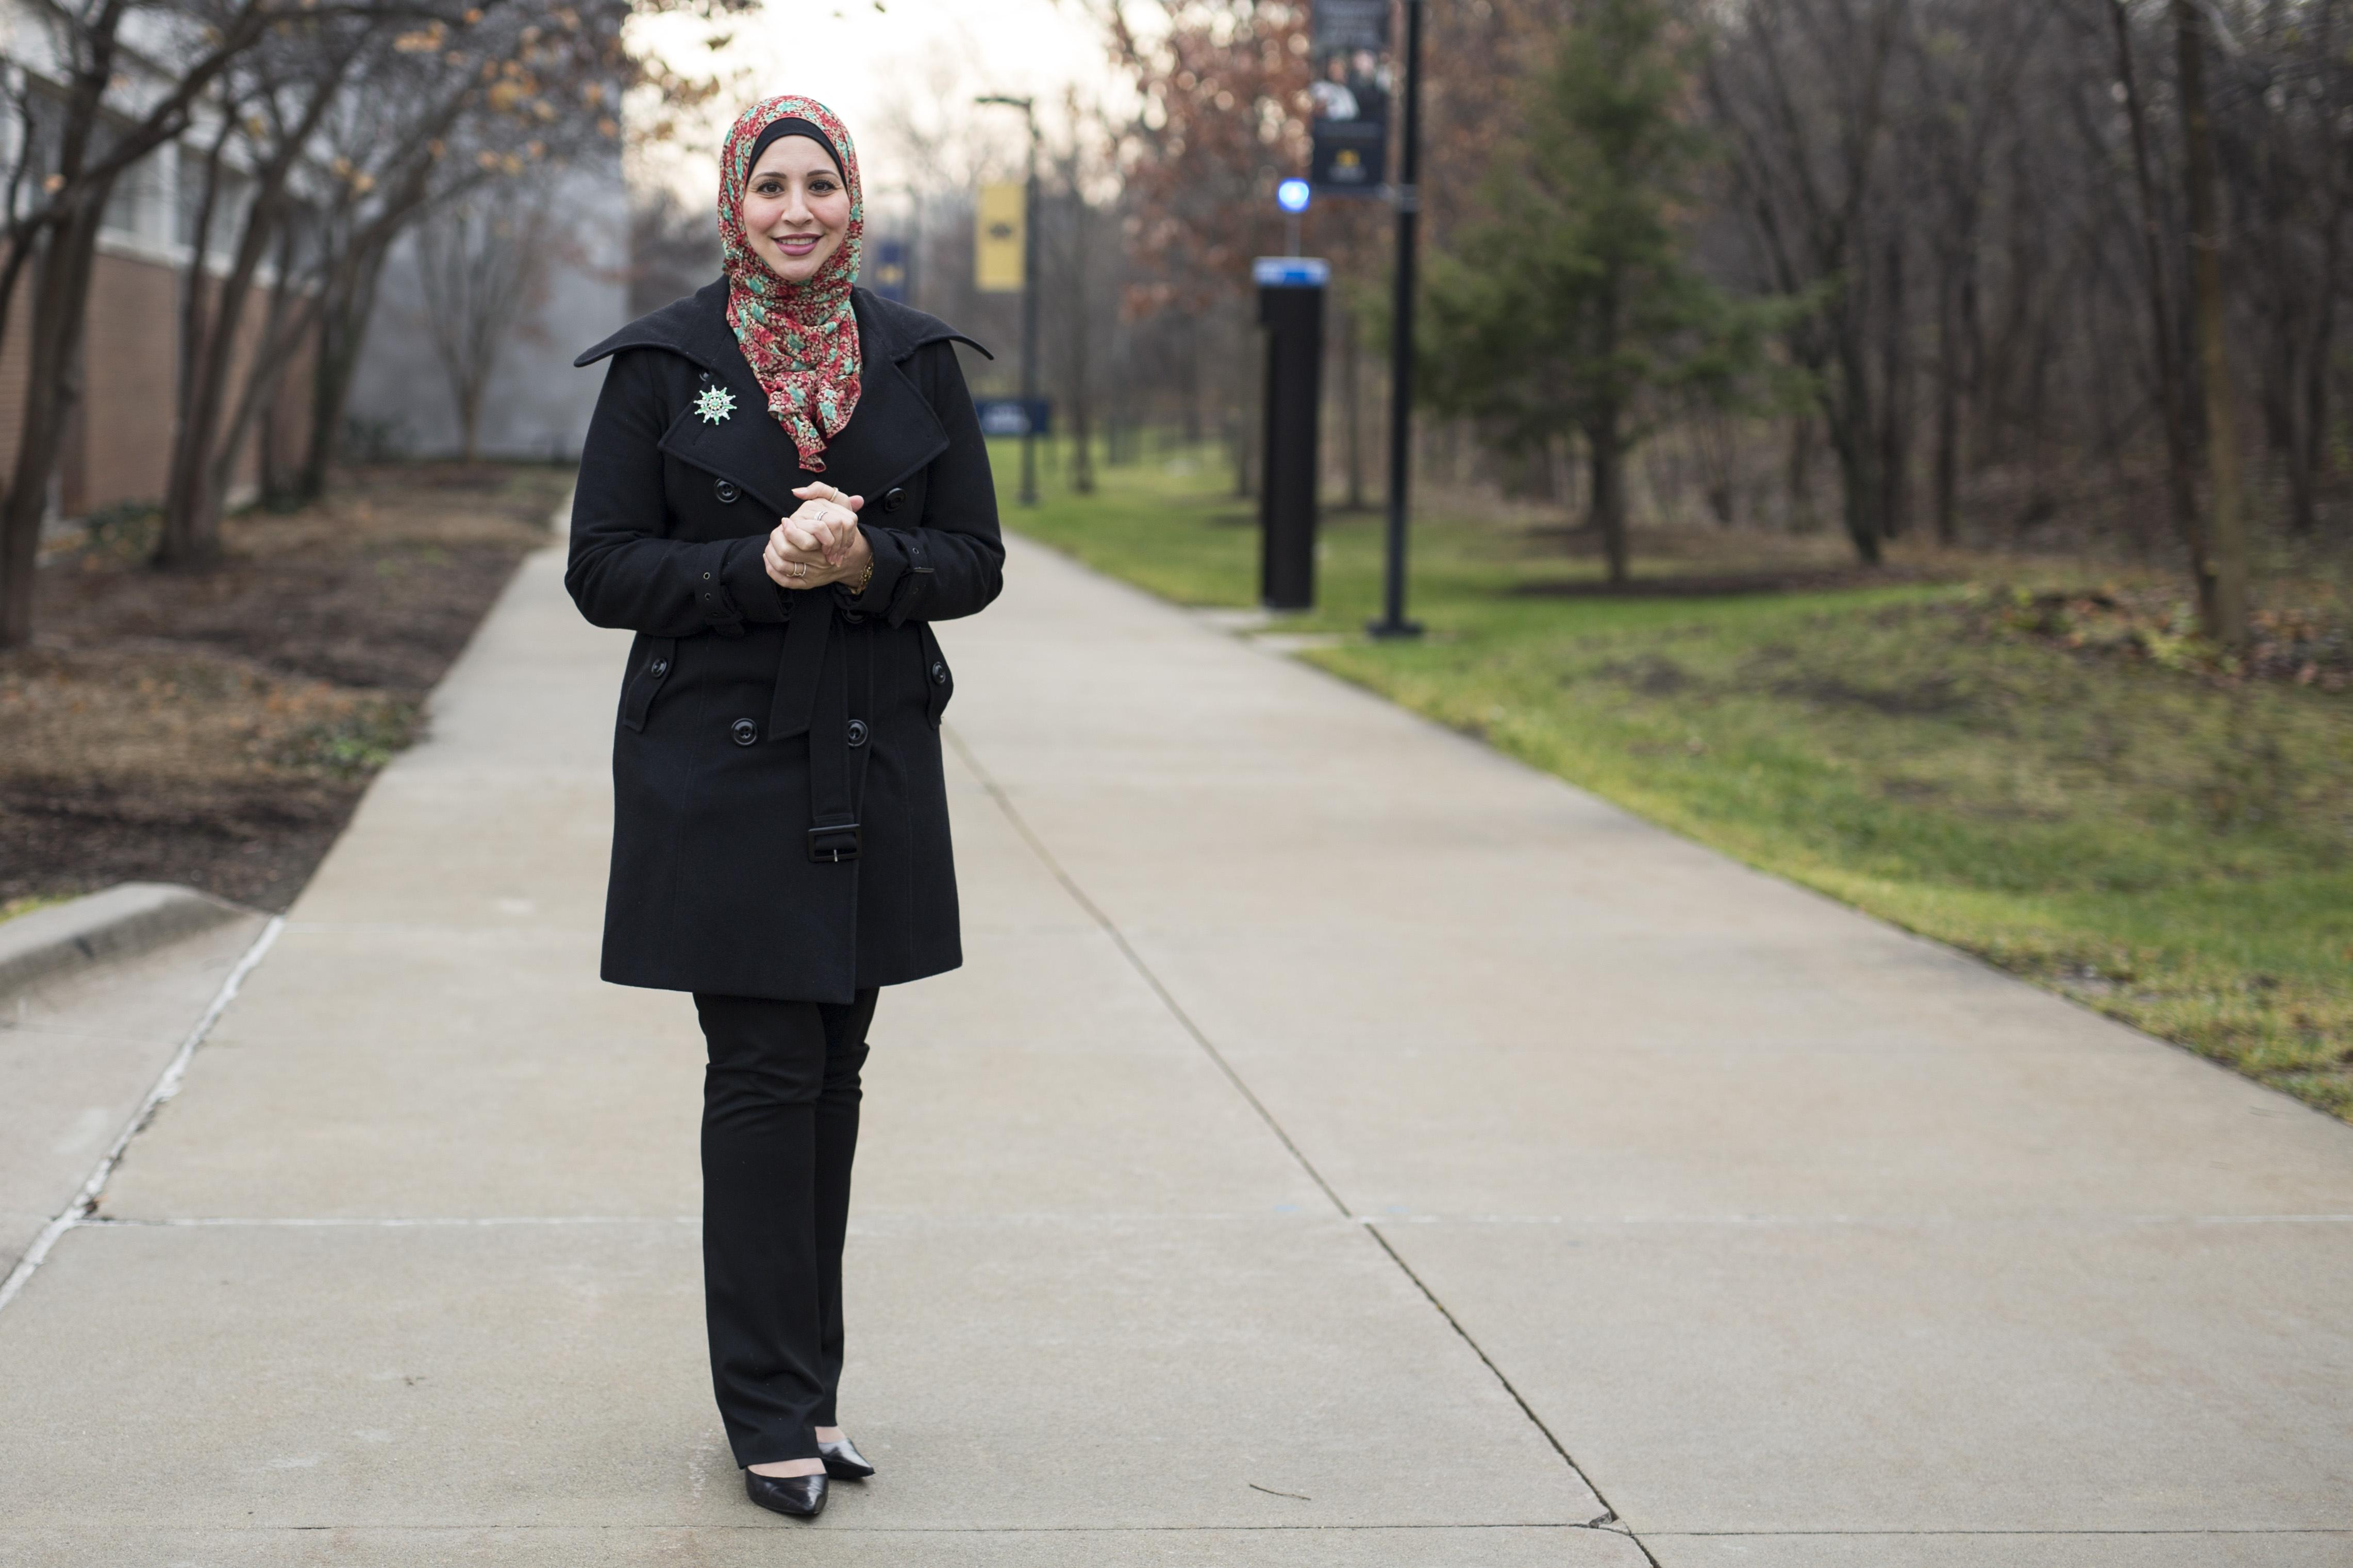 Us Muslim Women Debate Safety Of Hijab Amid Backlash The